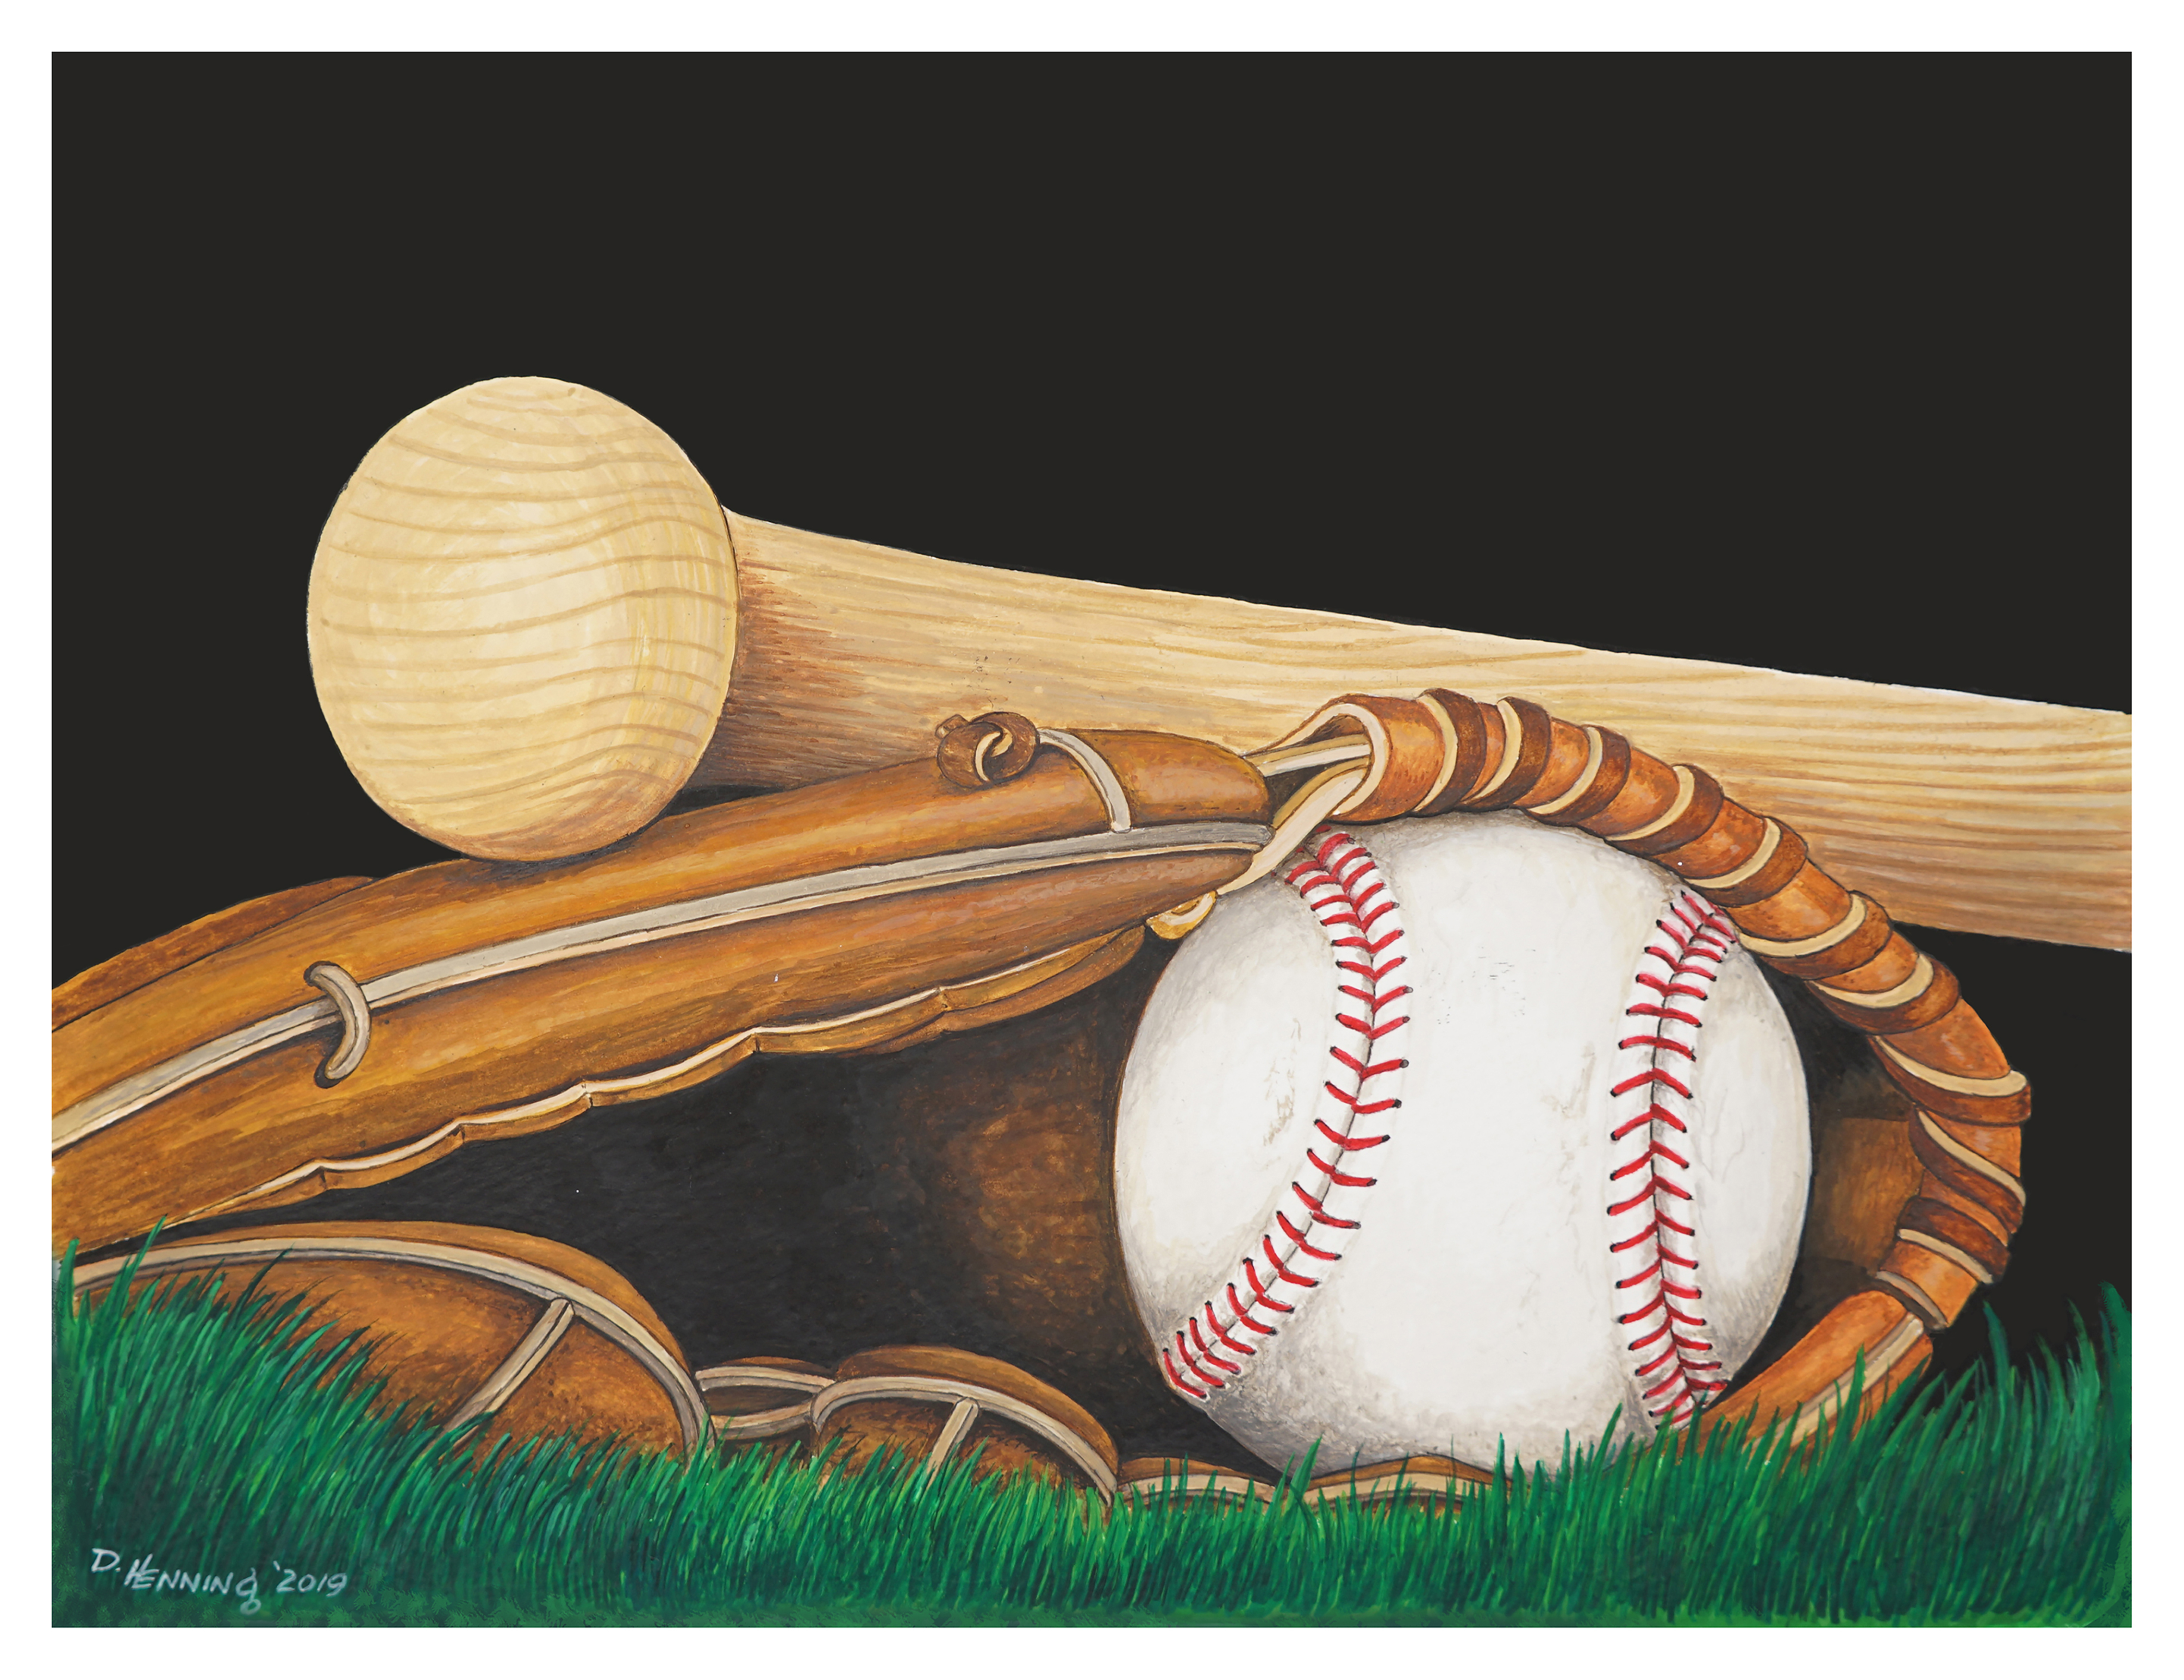 baseballglove13x10.jpg